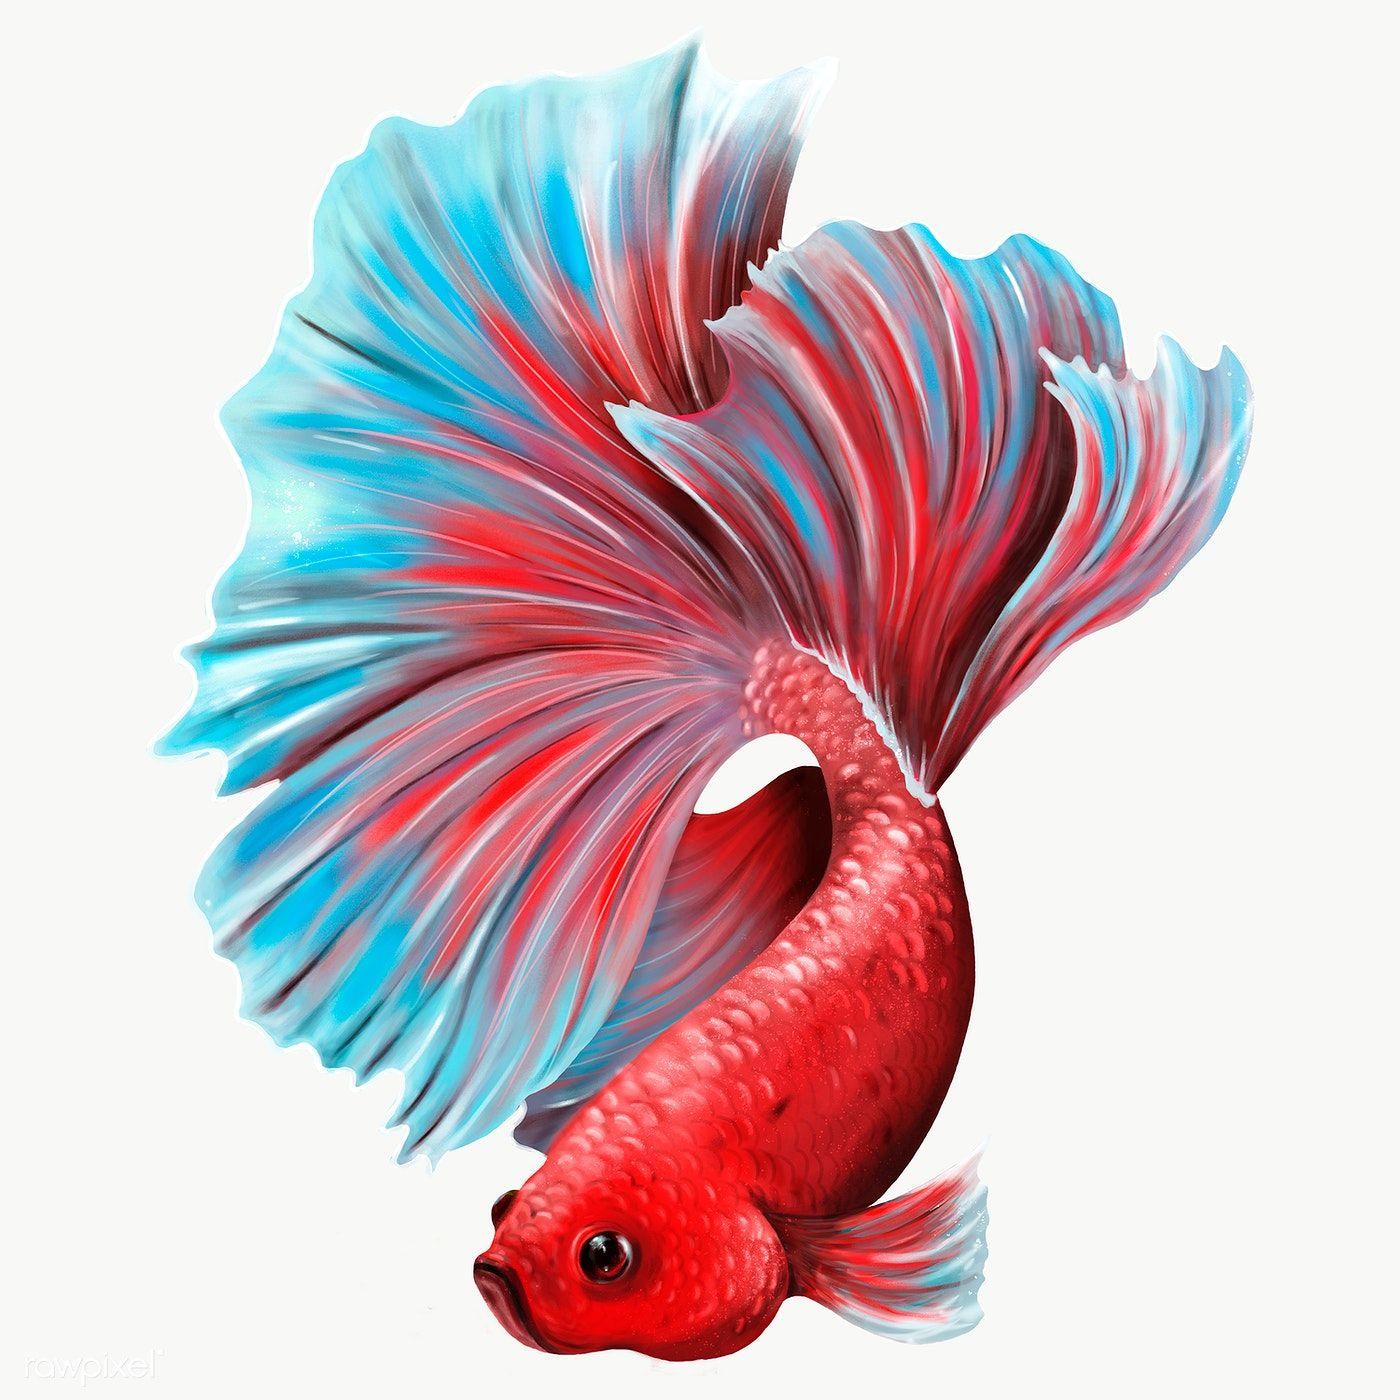 Colorful Betta Fish Design Element Premium Image By Rawpixel Com Te In 2021 Betta Fish Betta Fish Sketch